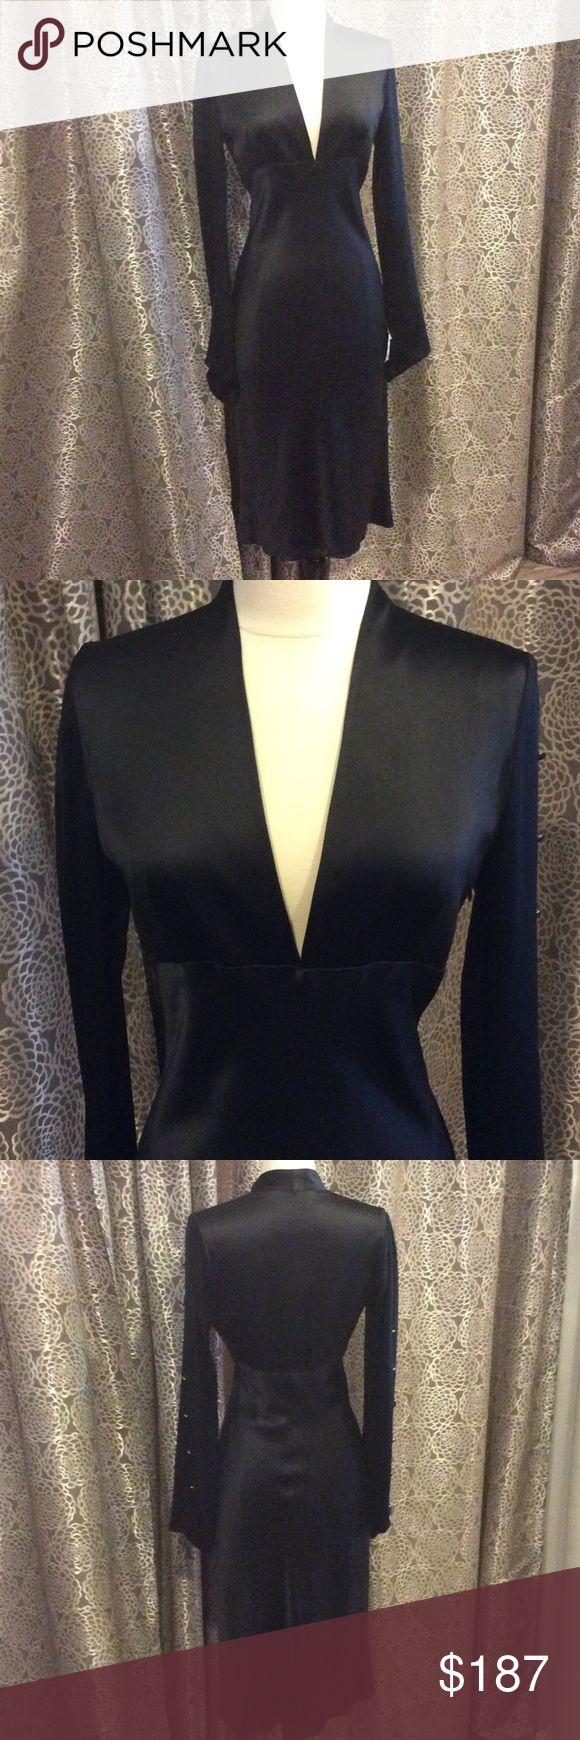 Monique Lhuillier silk dress Monique Lhuillier dress with deep v cut. Long sleeves with buttons down the arm. Zips up the side Monique Lhuillier Dresses